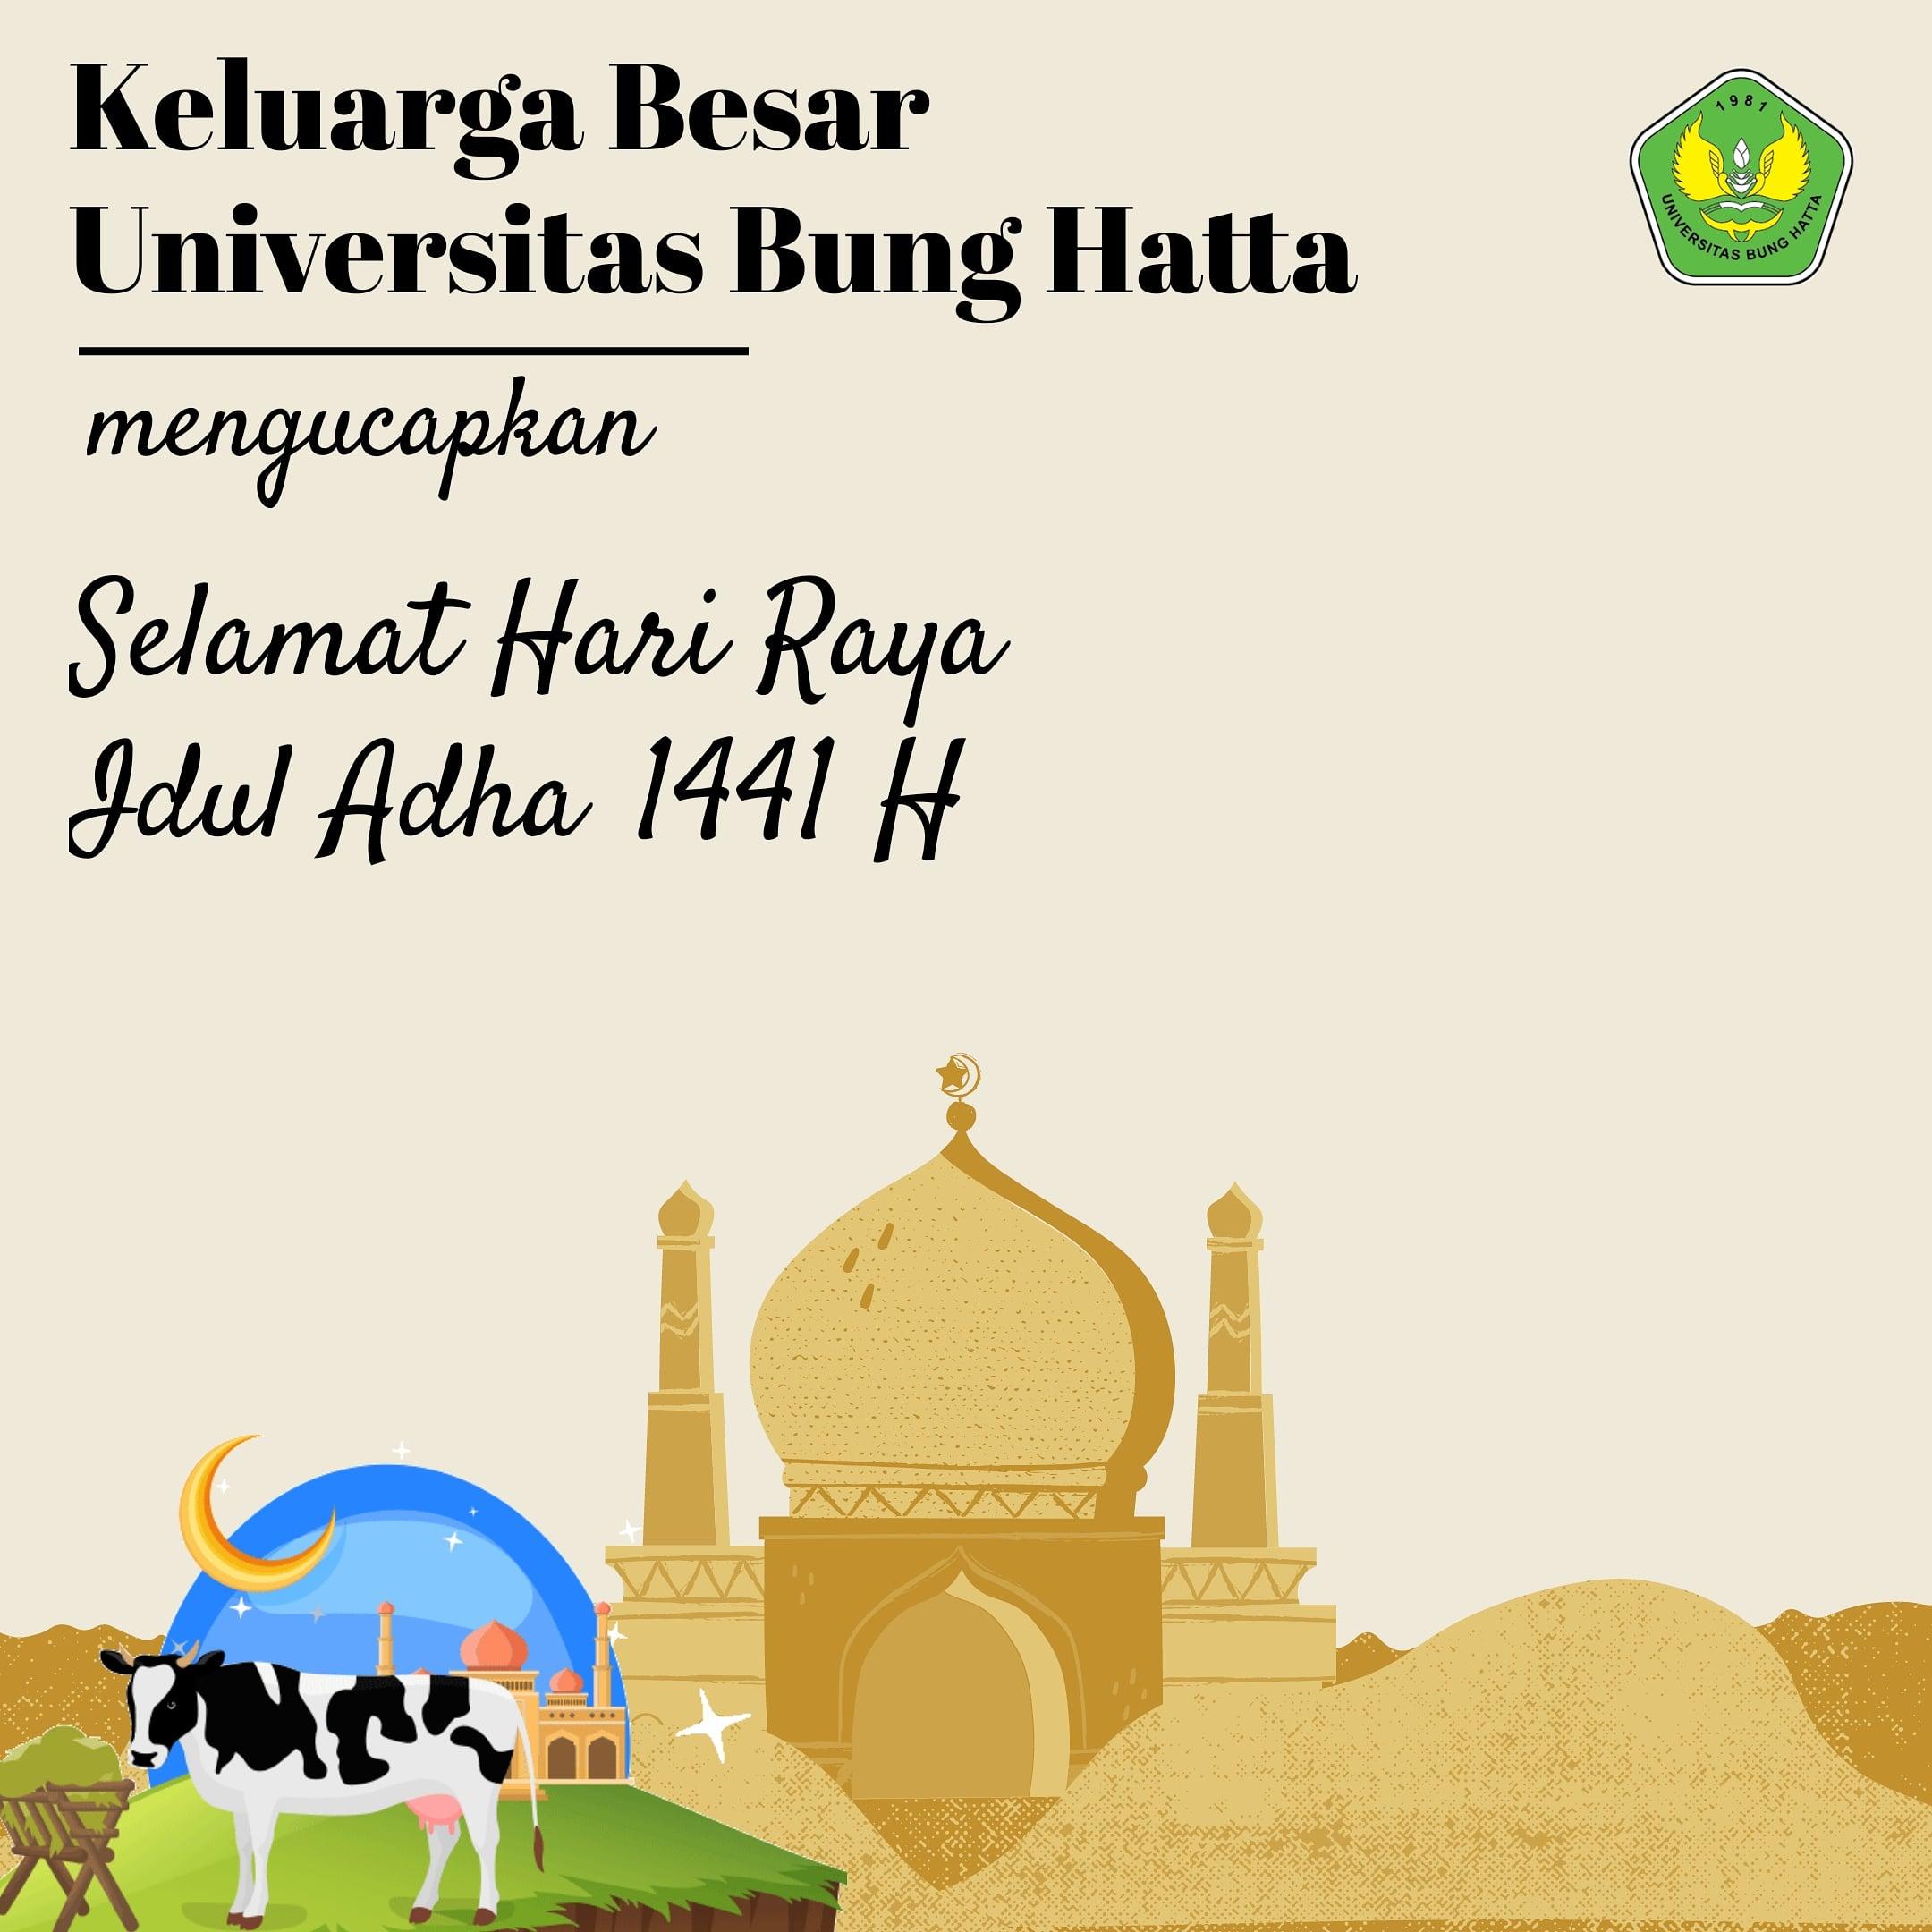 Keluarga besar Universitas Bung Hatta mengucapkan selamat hari raya Idul Adha 1441 H.